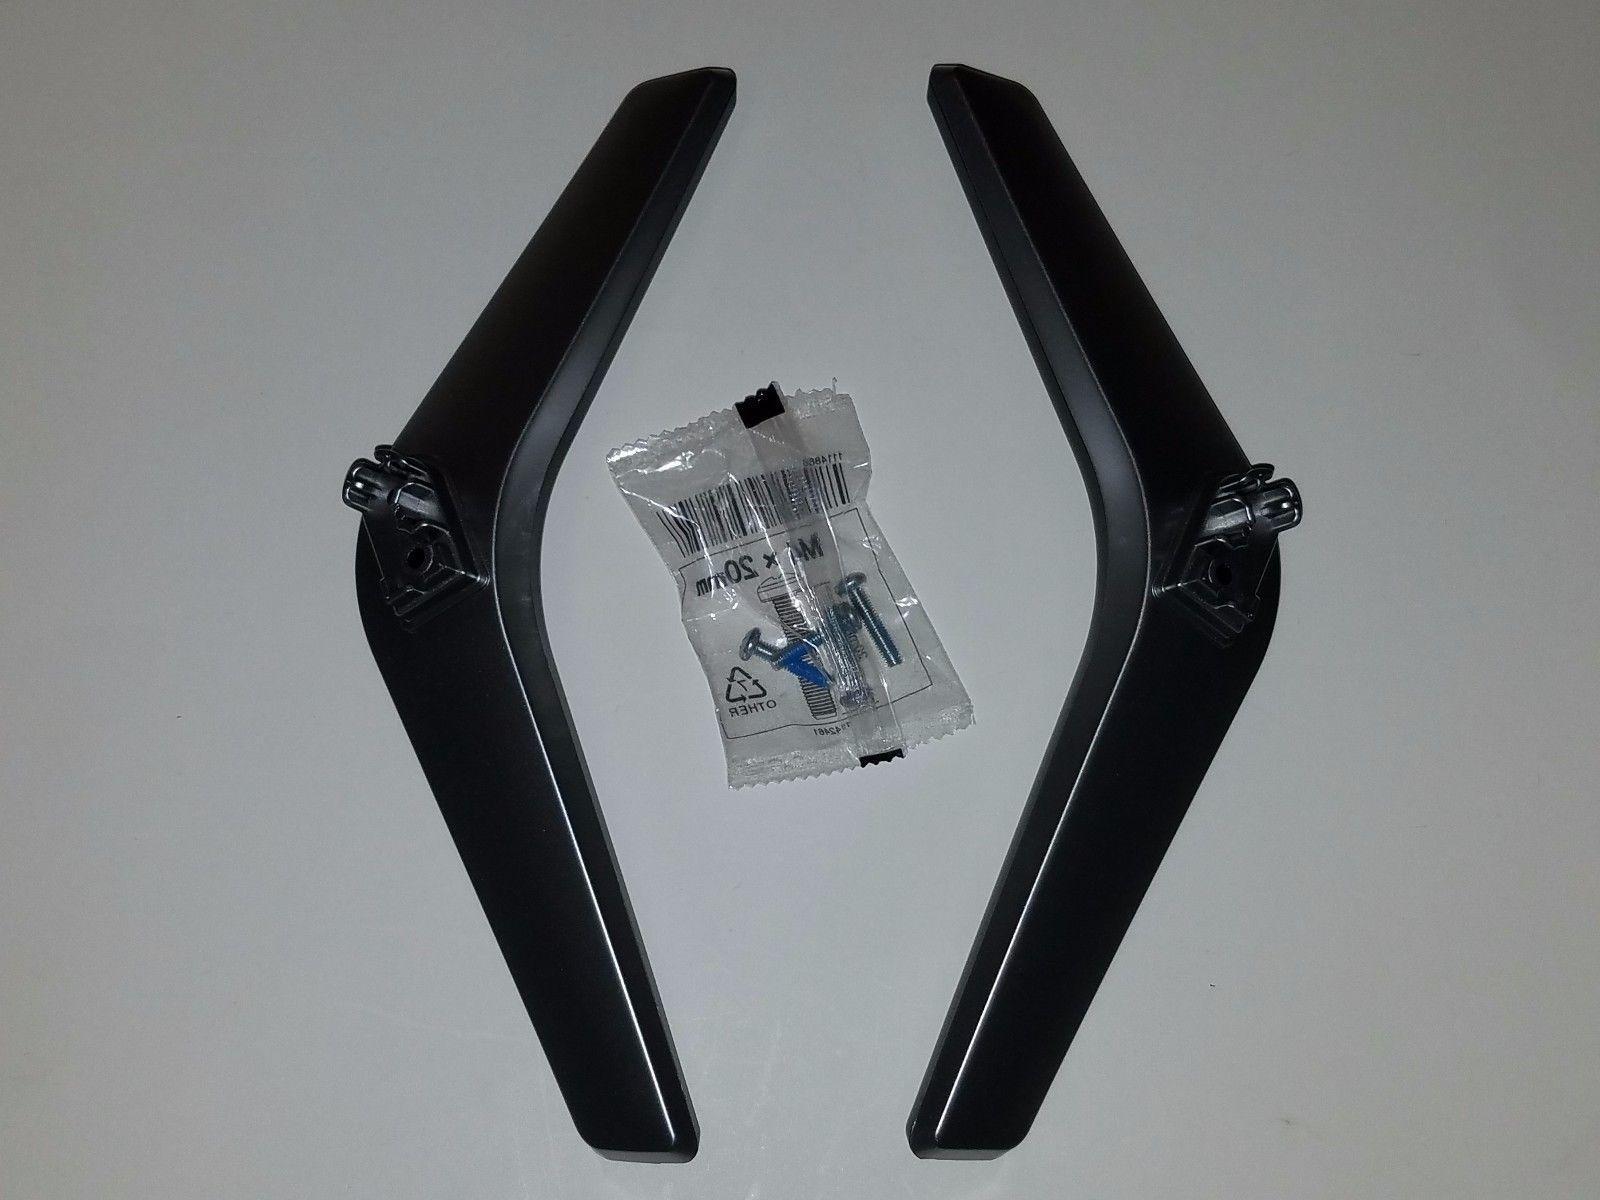 Sharp LC-55P7000U Stand Base Pedestal Legs with Screws